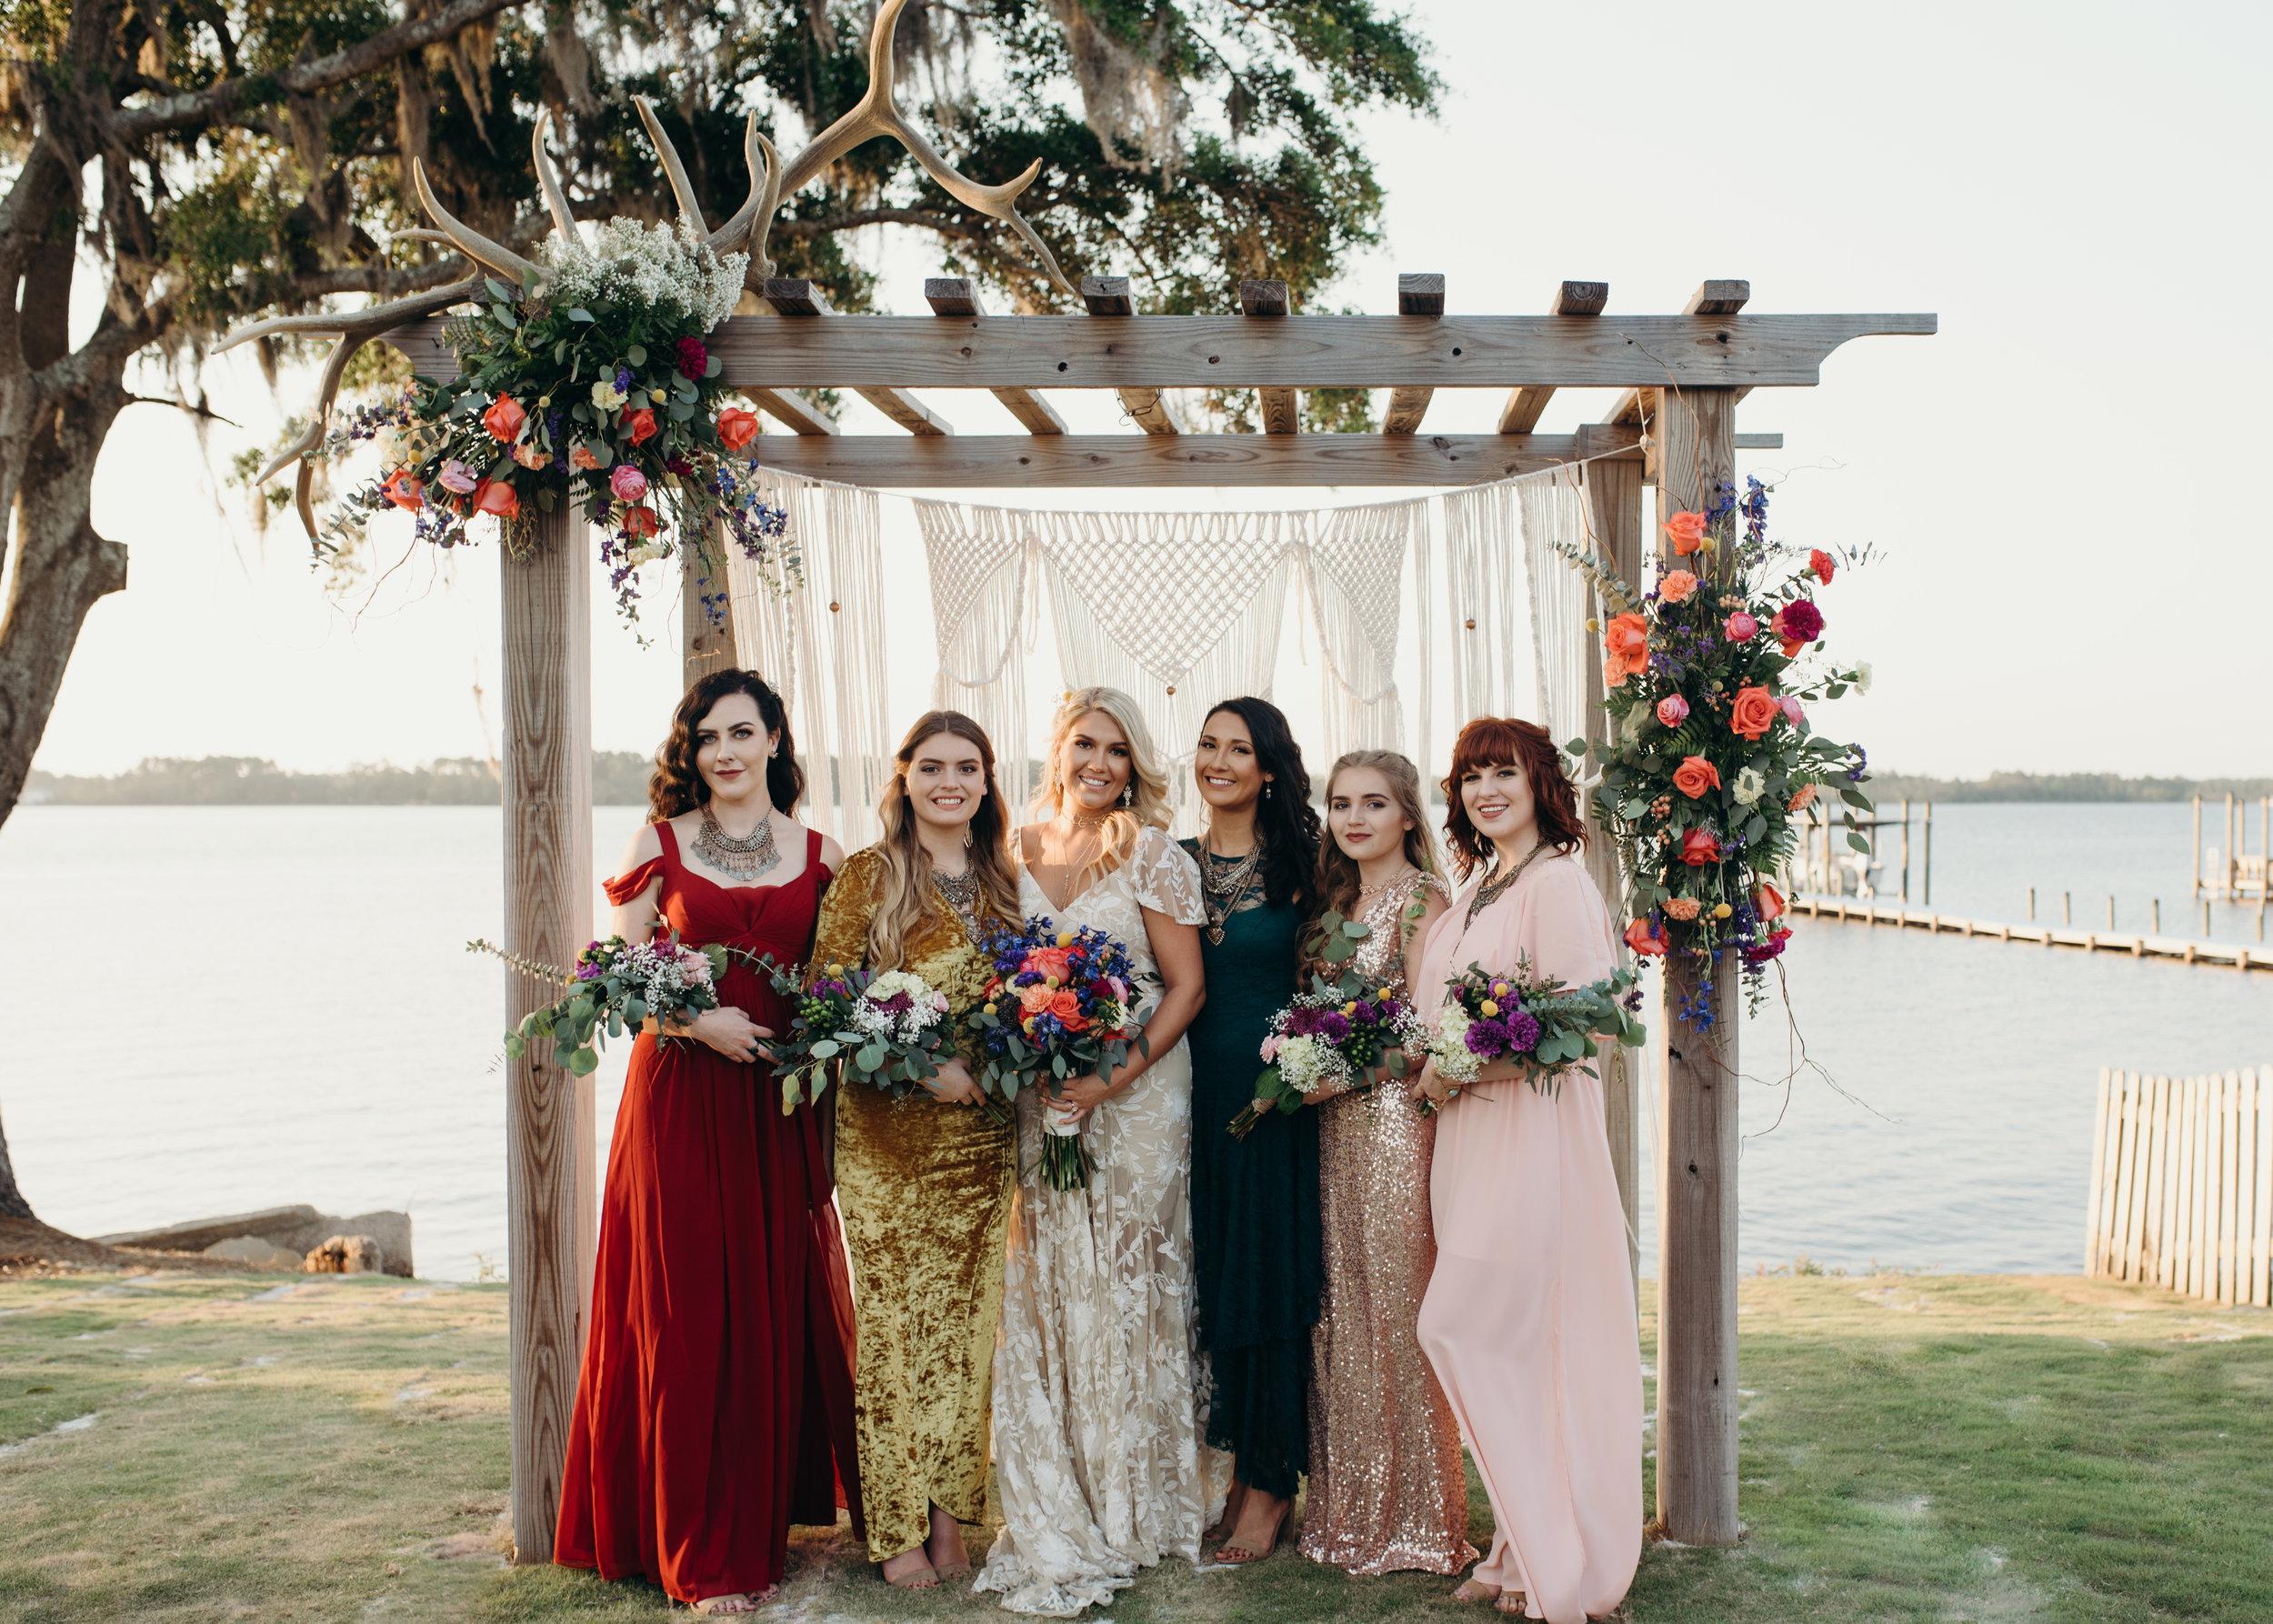 zayda-collin-panama-city-wedding-photography-trippy-bohemian-lisa-frank-wedding-group-shots-74.jpg